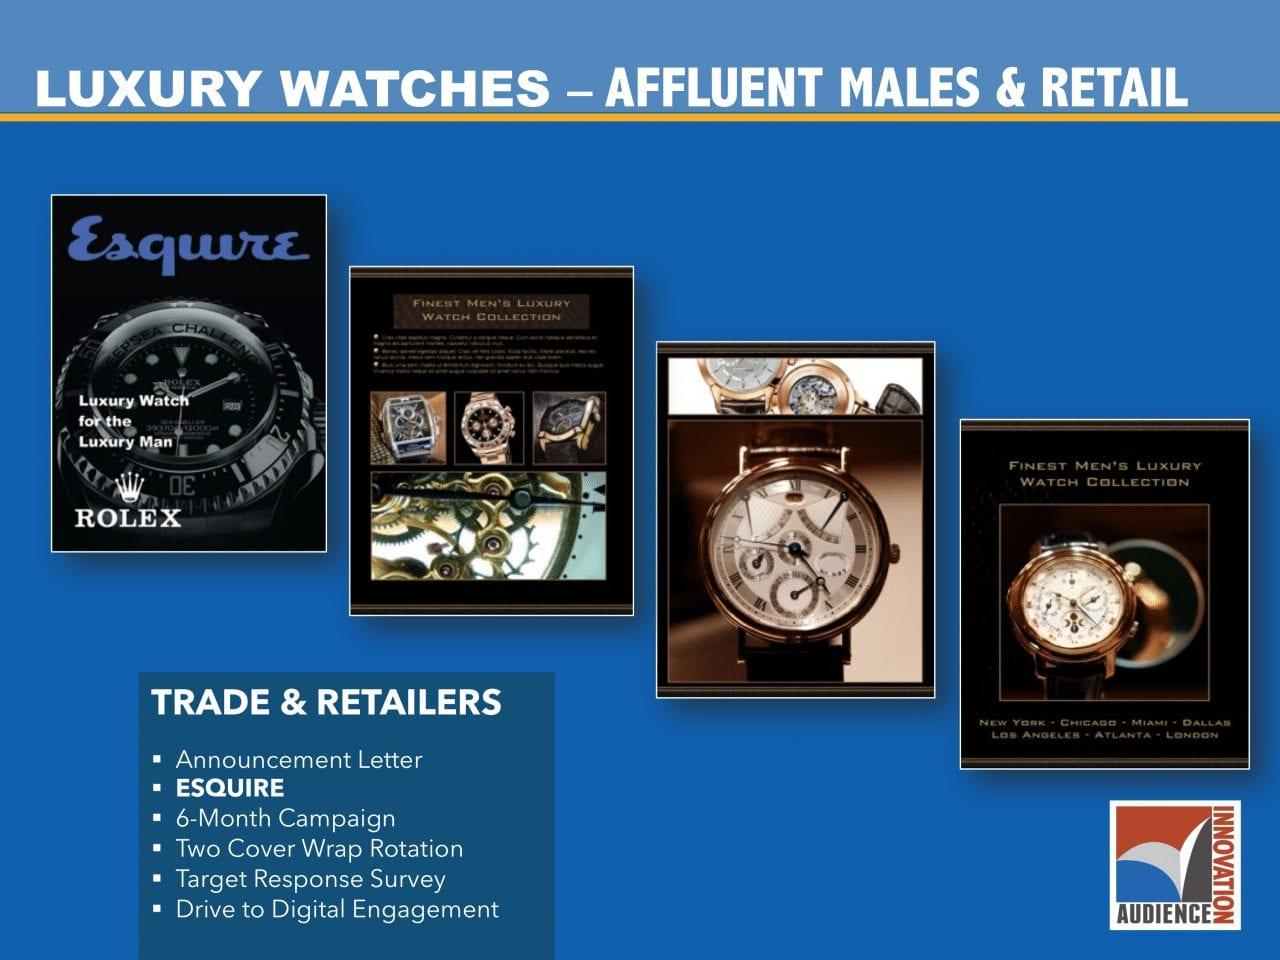 audience-innovation-magazine-cover-wrap-case-study-Slide04-1280x960.jpg